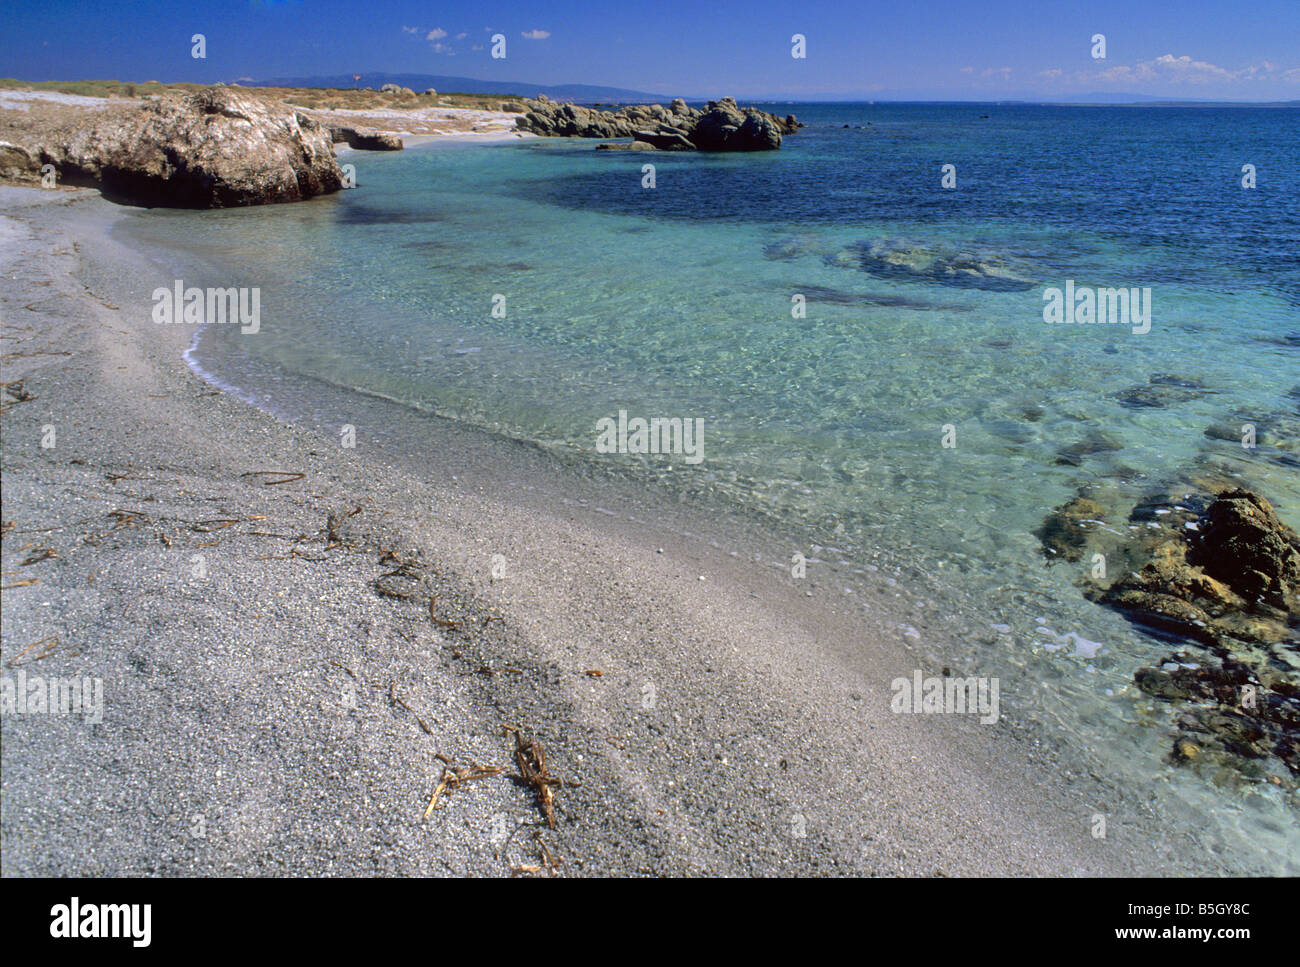 Parc de l'île de Mal di Ventre, Cagliari, Sardaigne, Italie Photo Stock